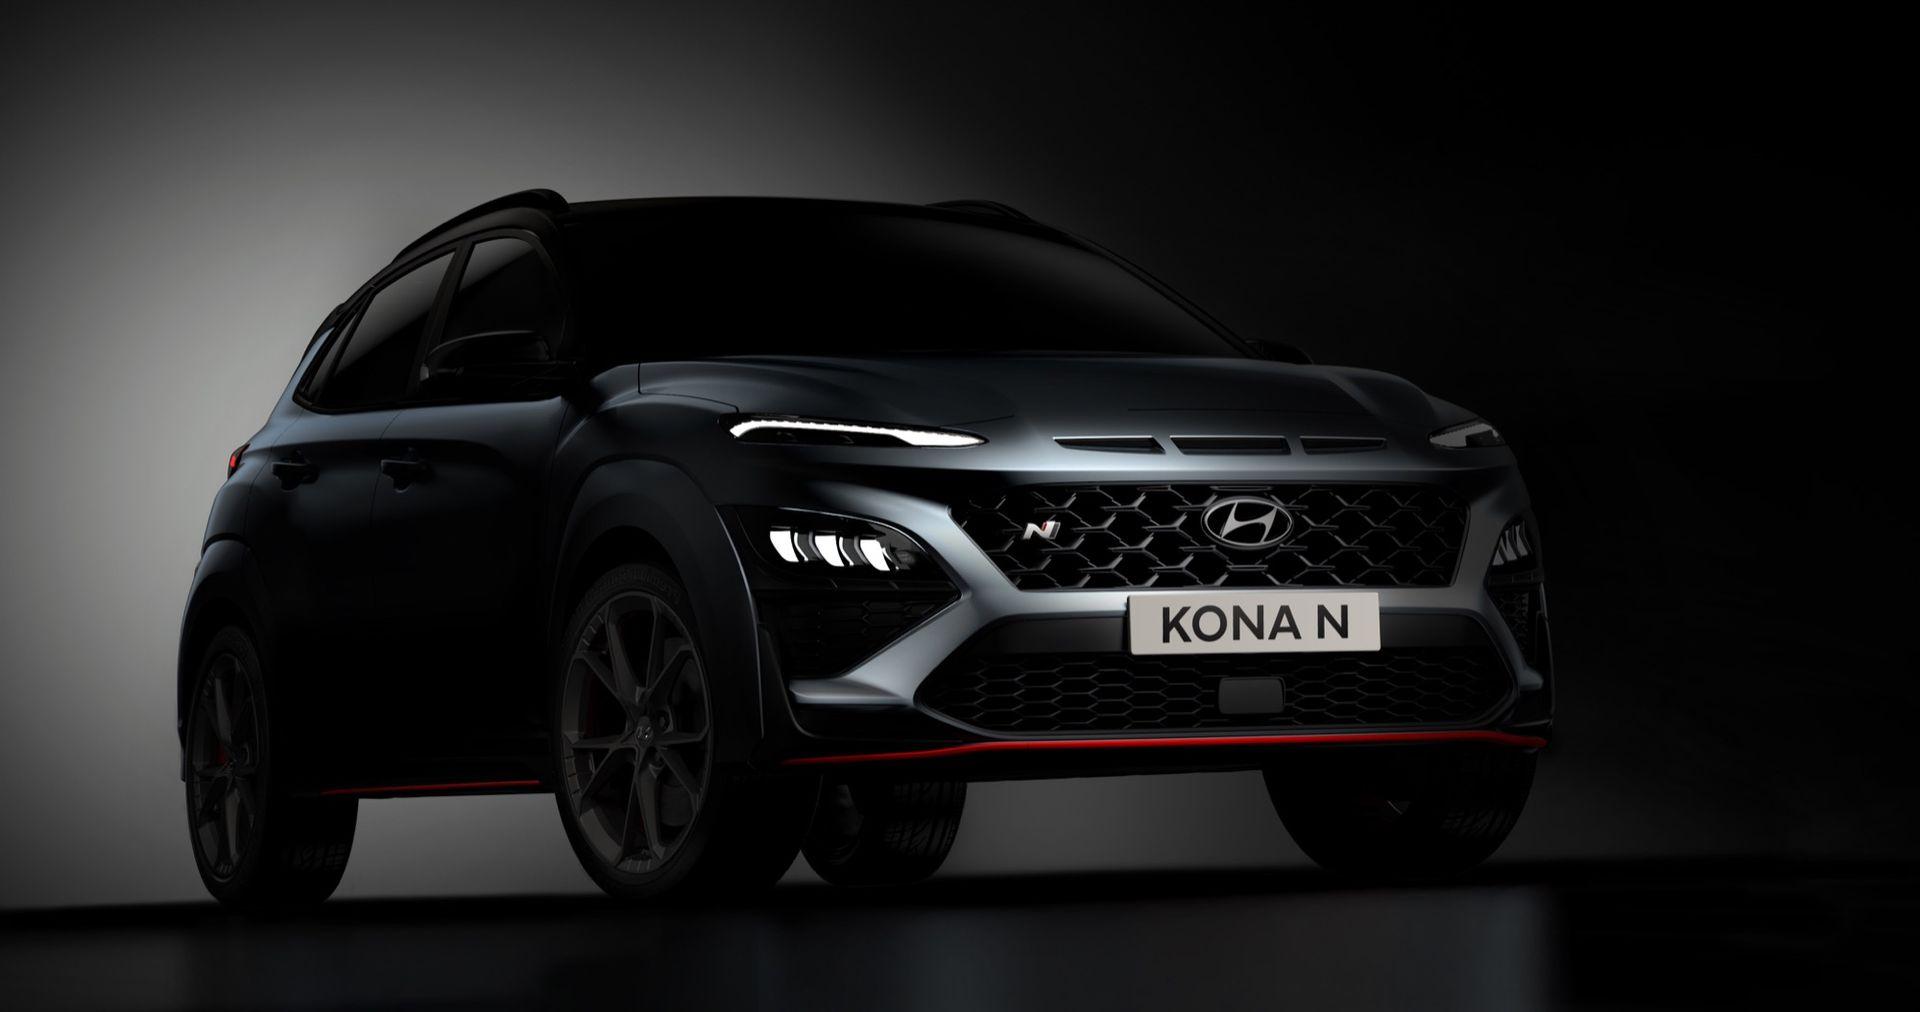 Fler bilder på Hyundai Kona N